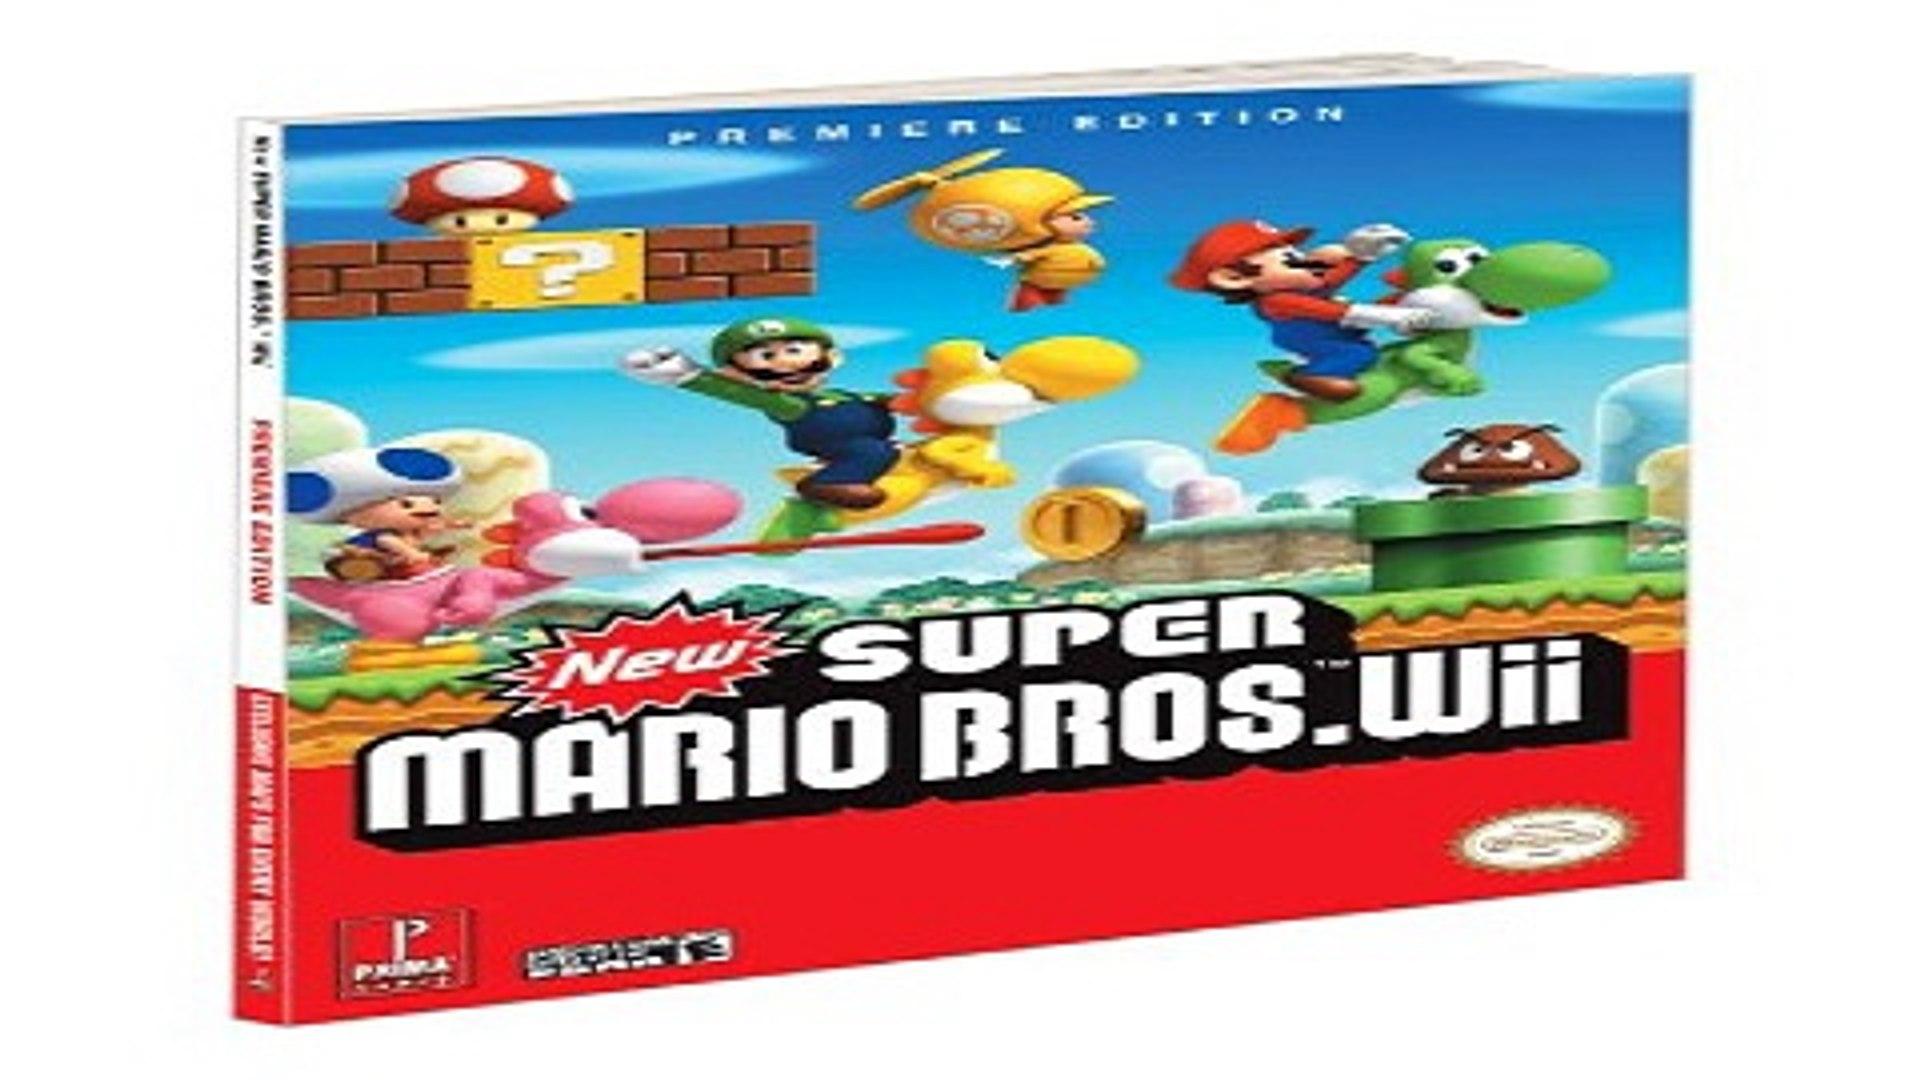 Download New Super Mario Bros Wii Prima Official Game Guide Prima Official  Game Guides